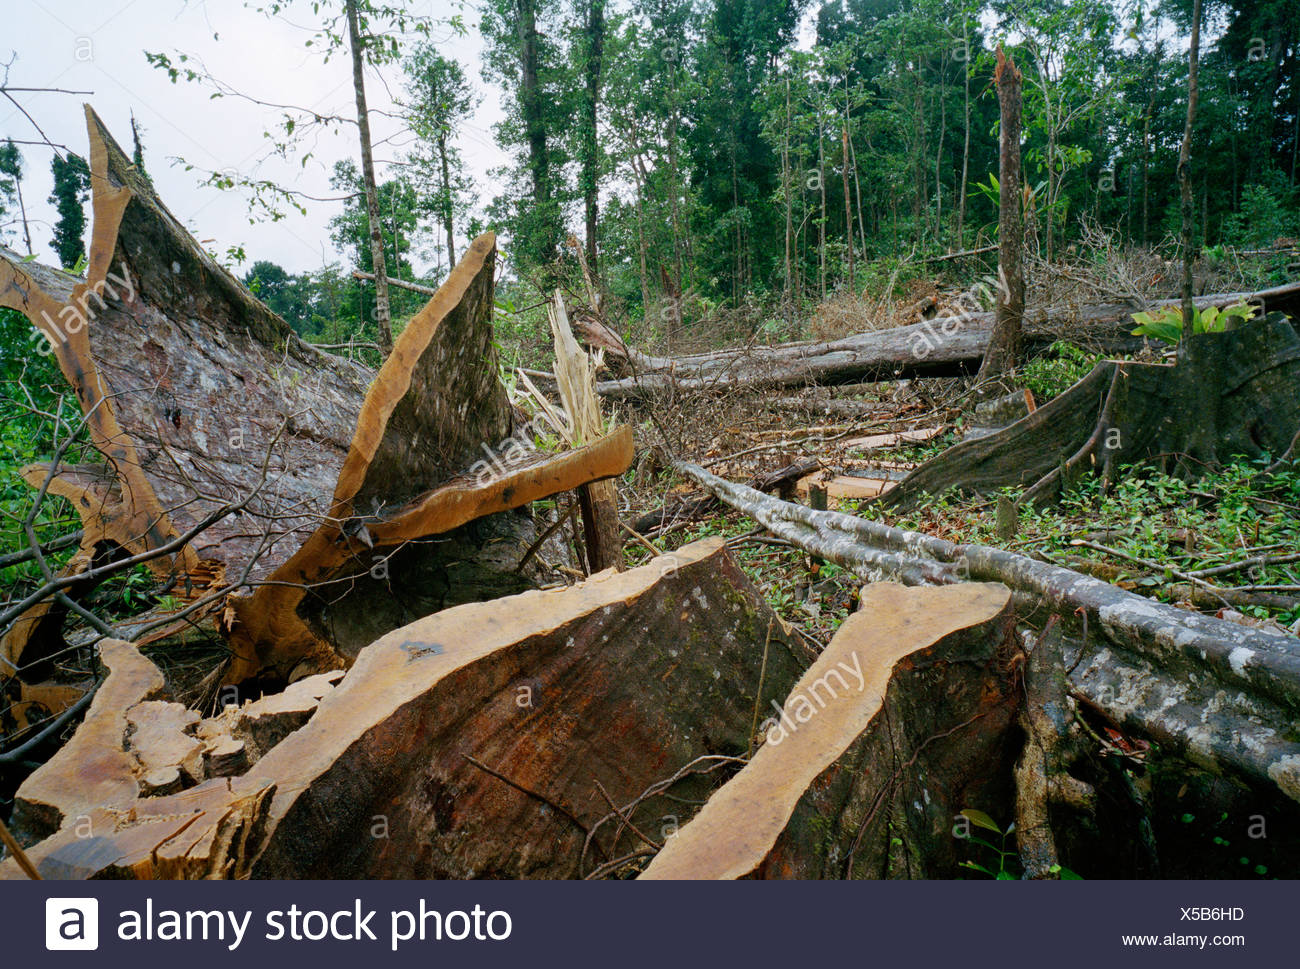 RAINFOREST DESTROYED - Stock Image